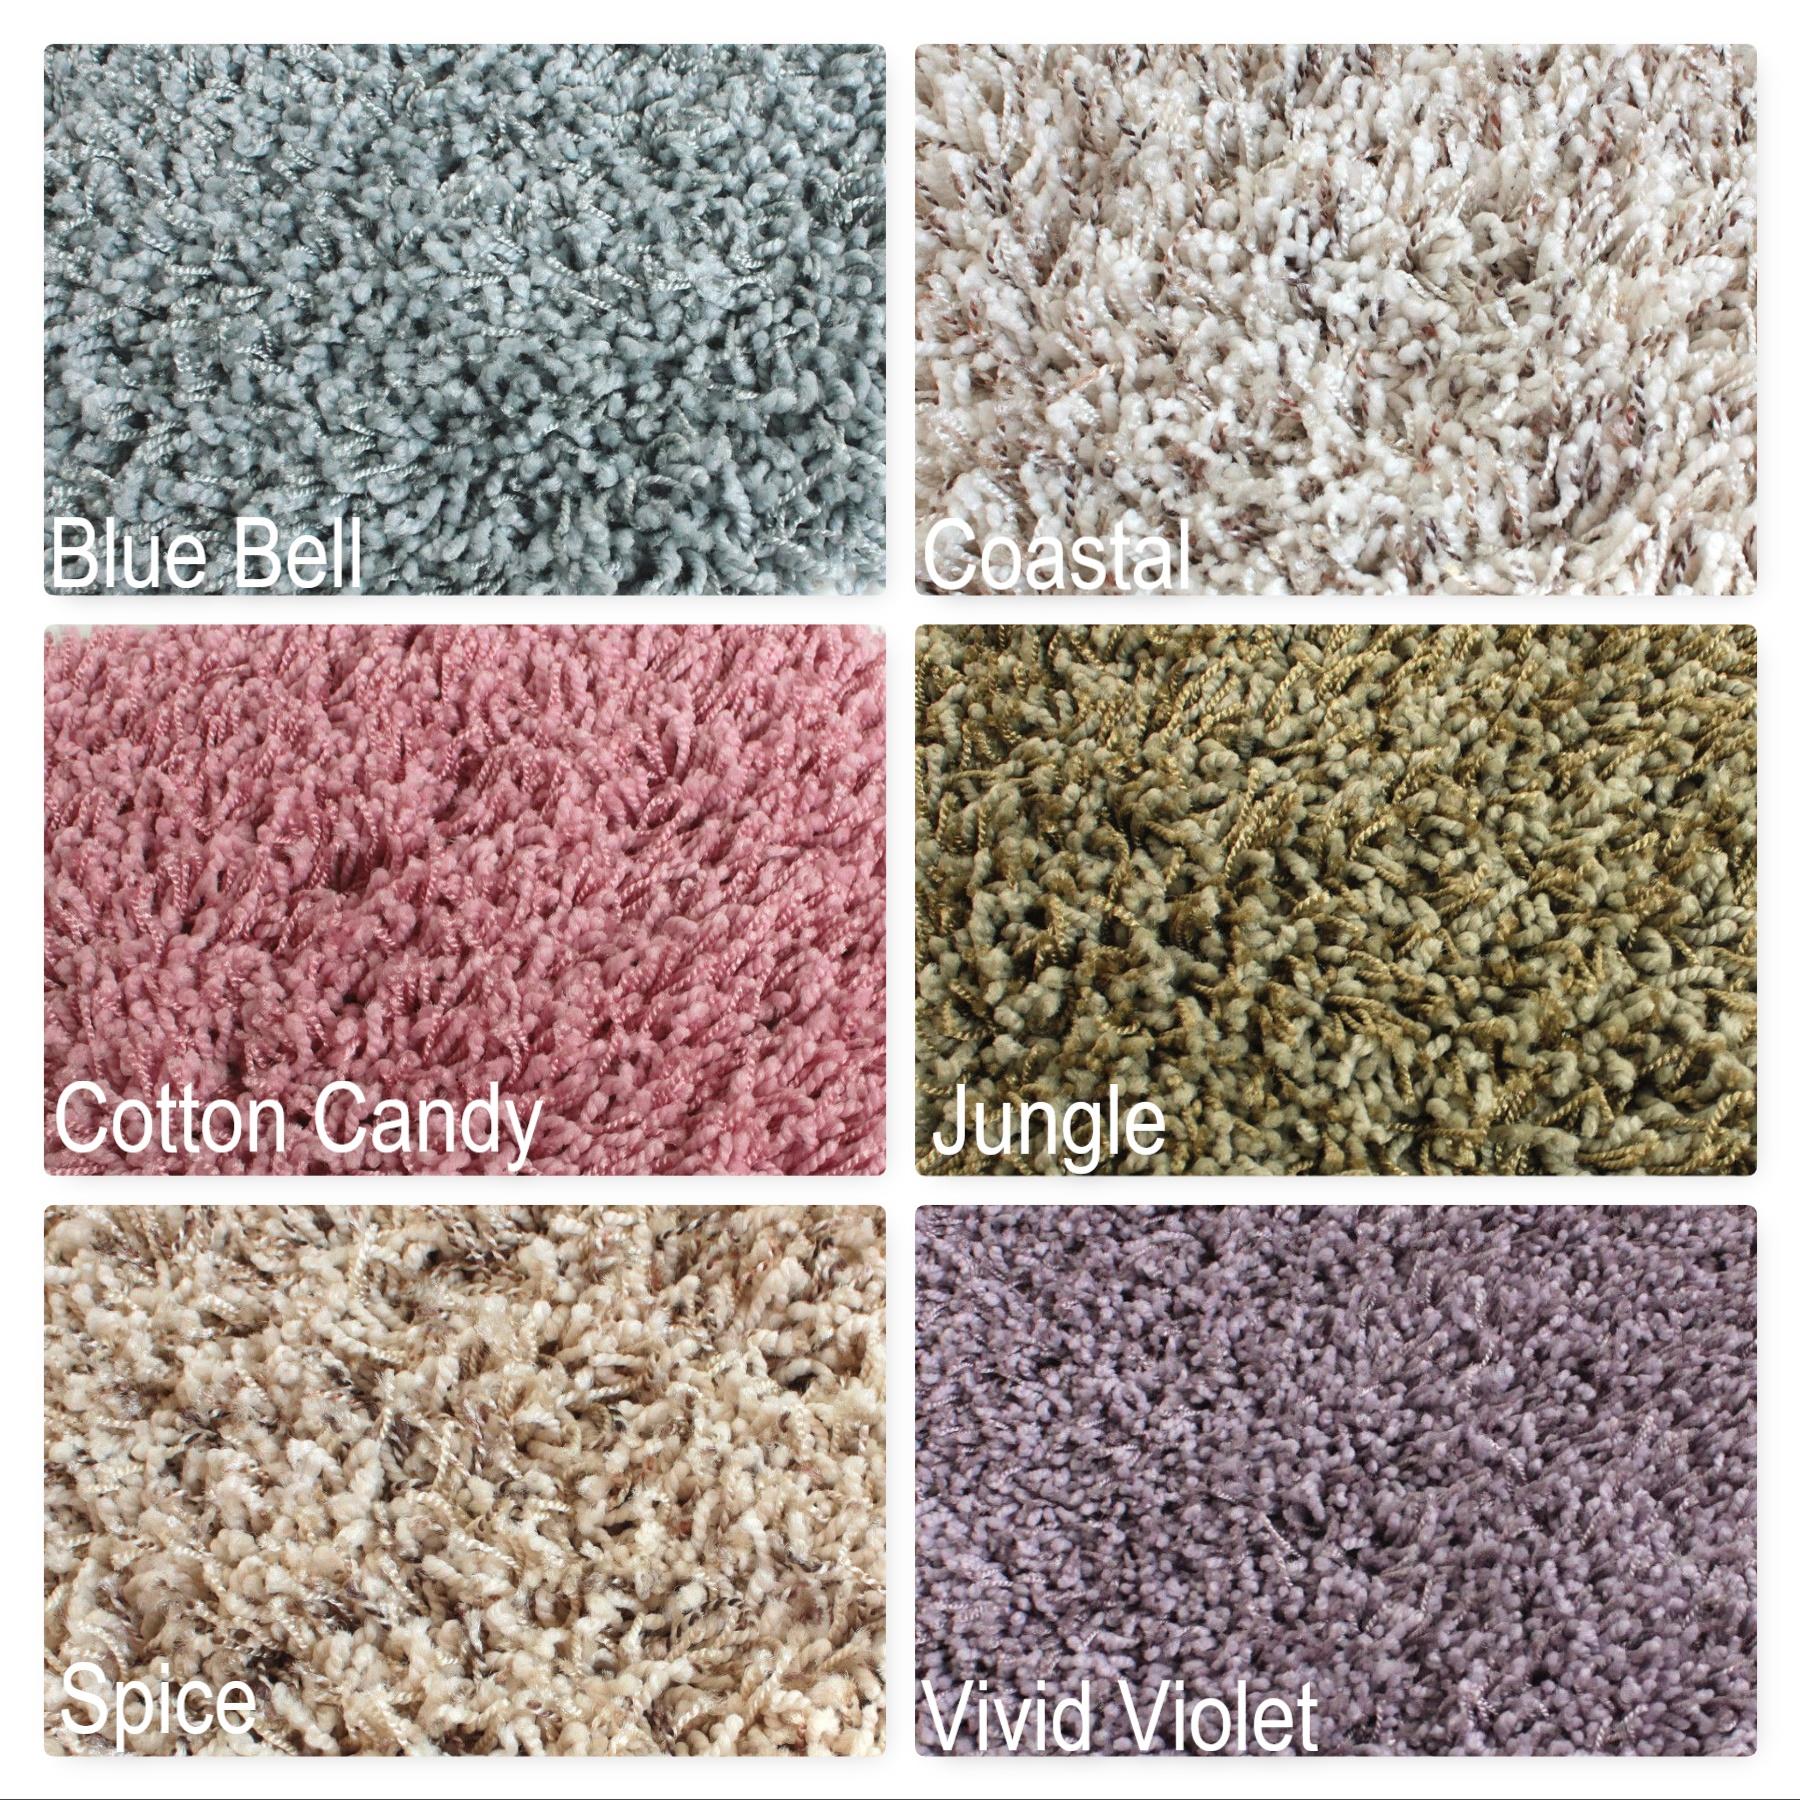 Uptown Girl Indoor Shag Carpet Area Rug Collection | 1″ Thick 63 oz Shag  Soft Indoor Carpet Area Rug Multiple Colors